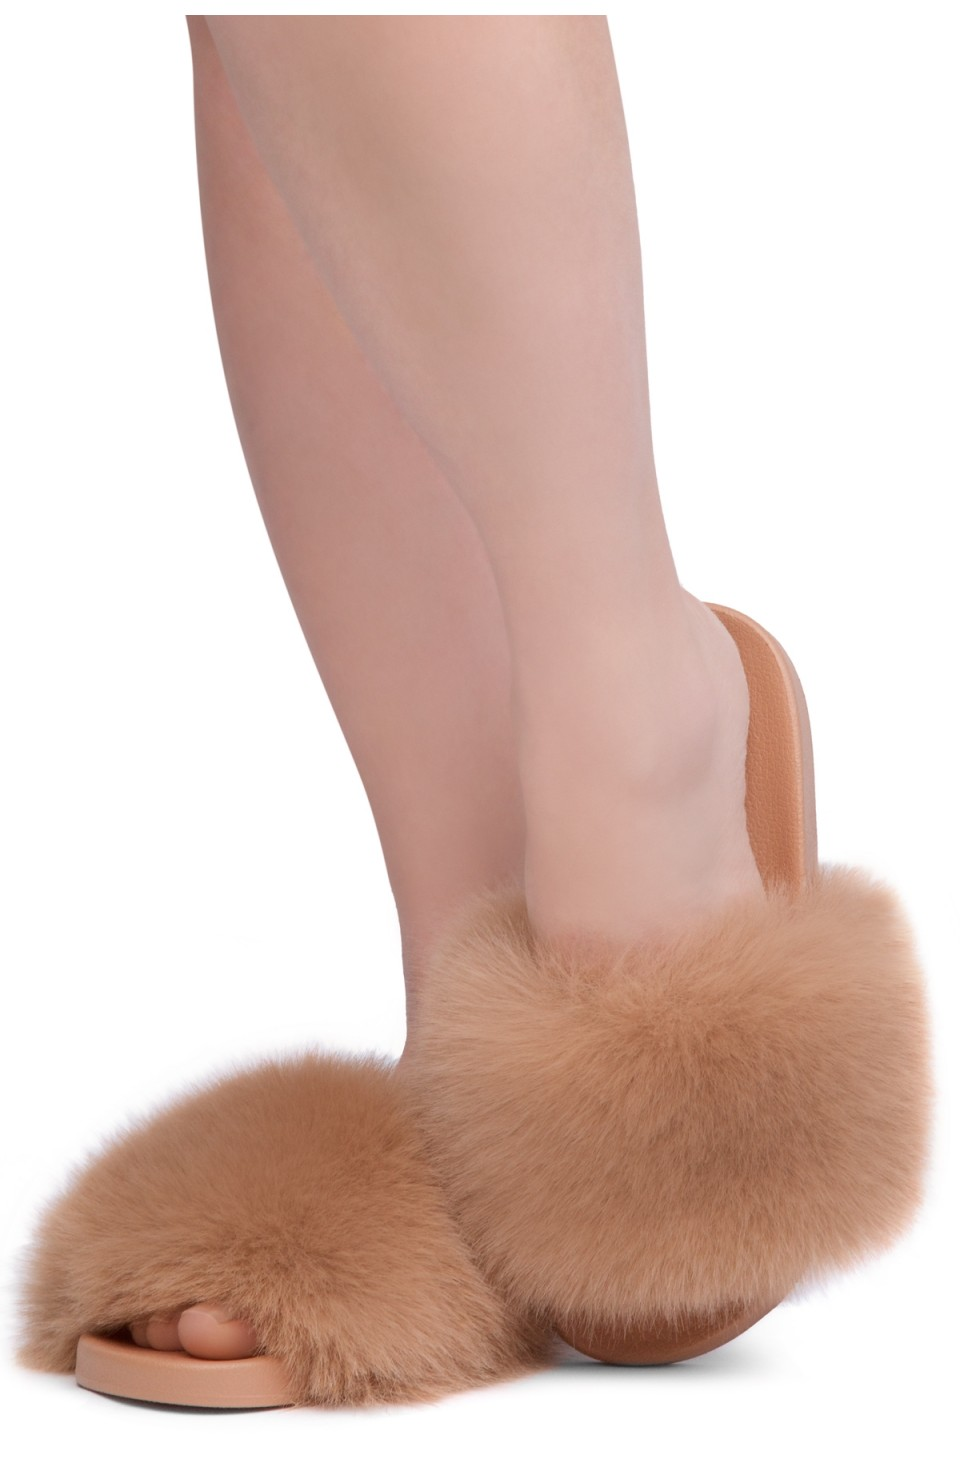 Shoe Land NIKINI Womens Fur Slides Fuzzy Slippers Fashion Fluffy Comfort Flat Sandals(2020 Camel/Camel)